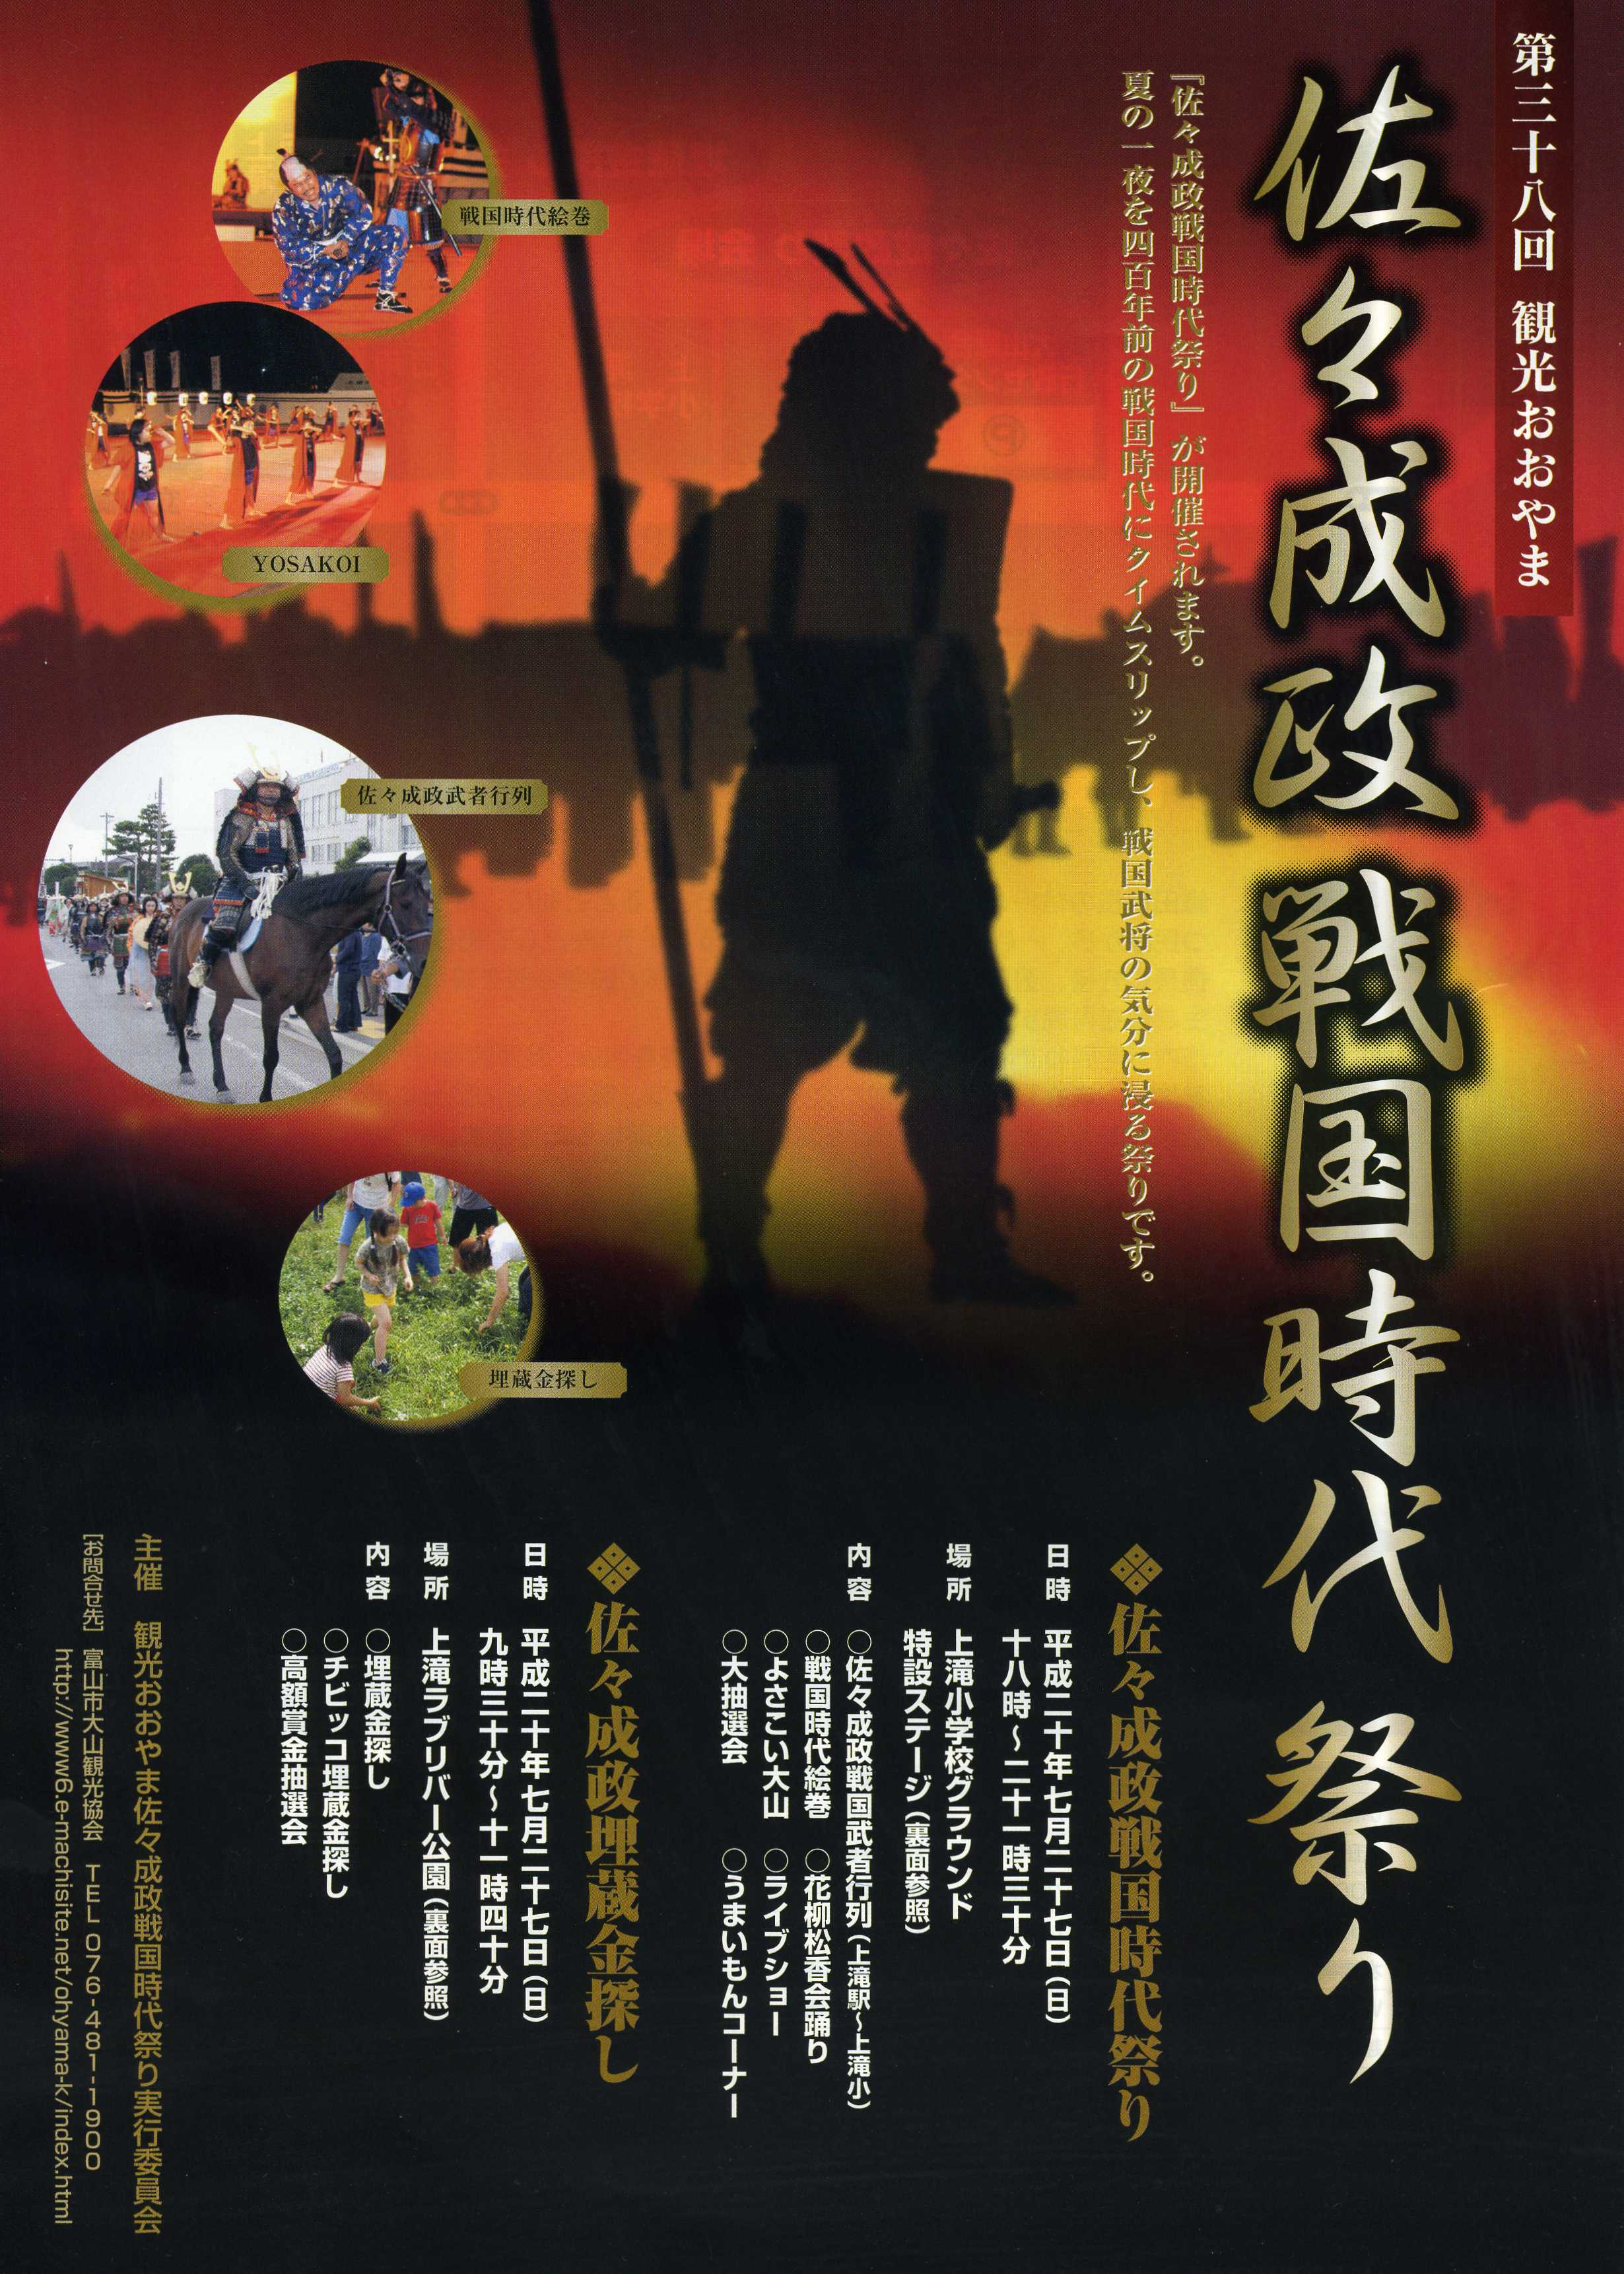 b4f706461b TOYAMA-IMPULSE WEBLOG: 観光おおやま佐々成政戦国時代祭り